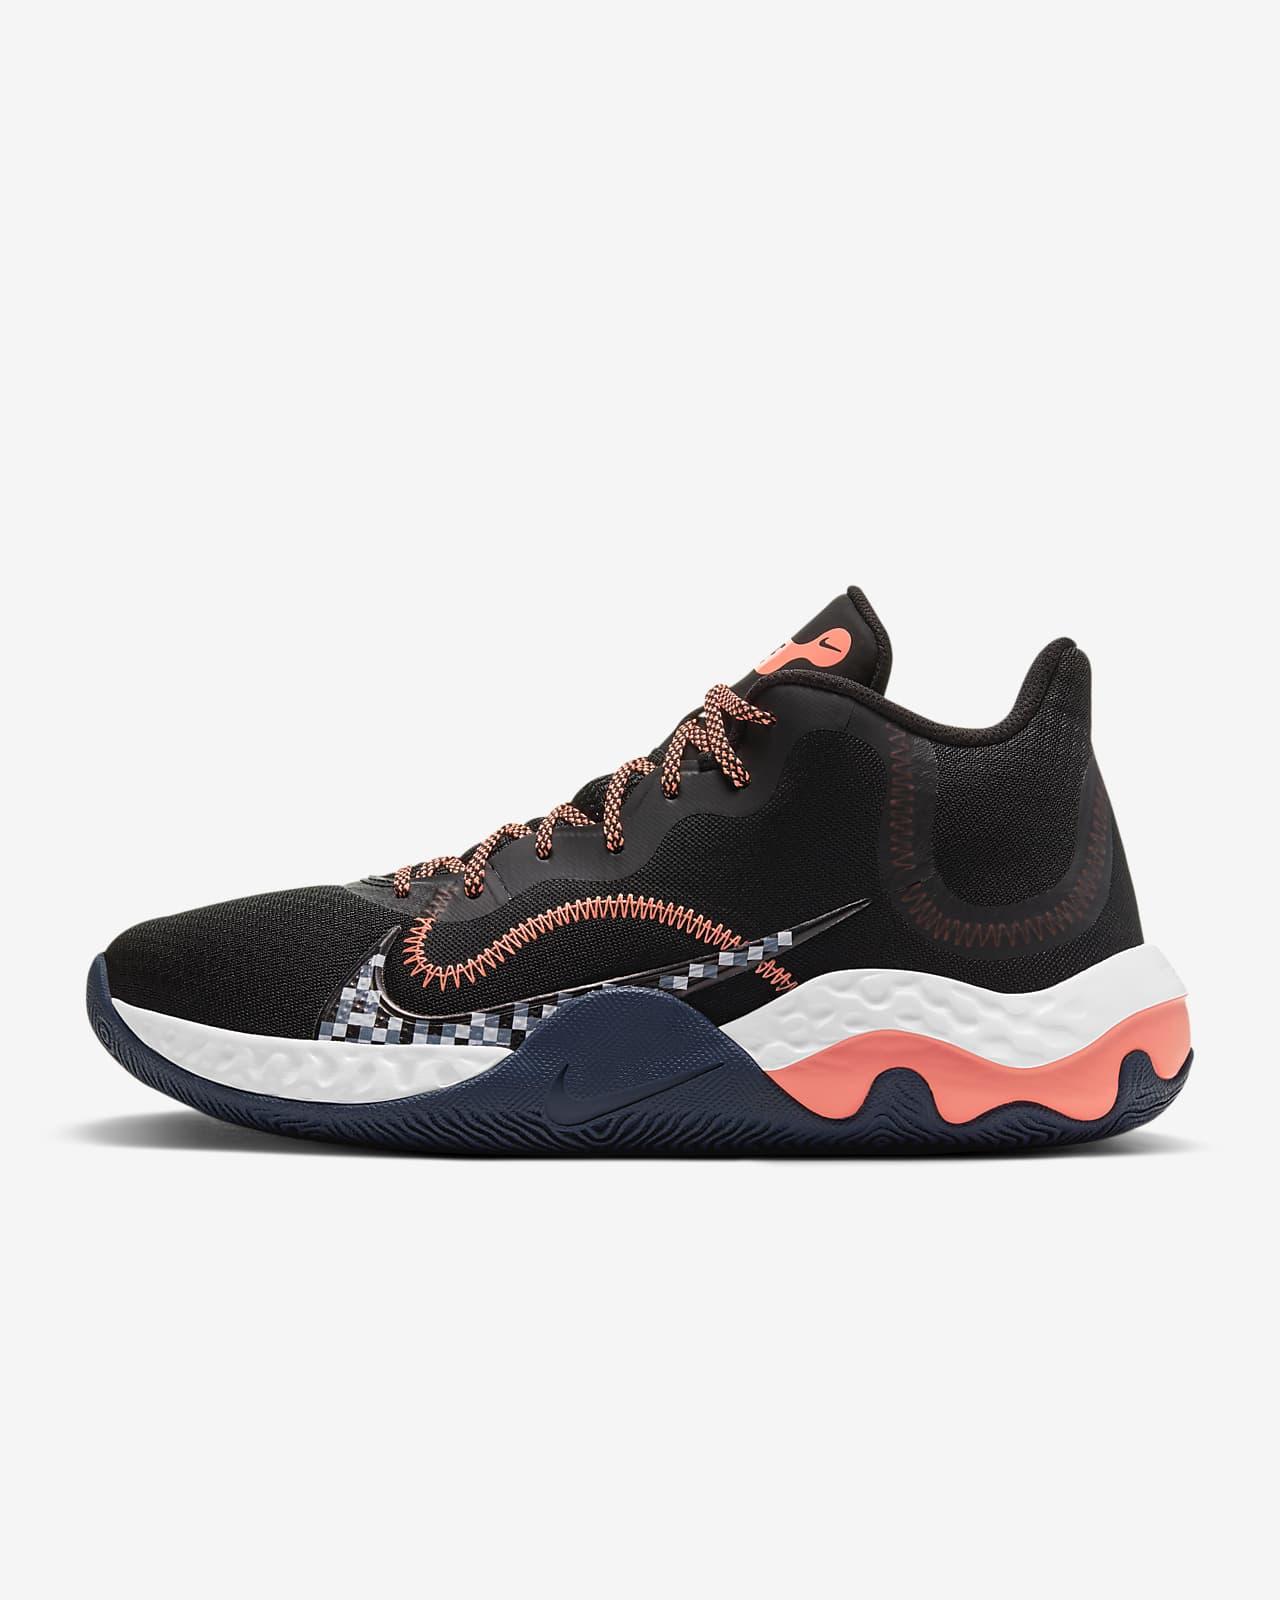 Chaussure de basketball Nike Renew Elevate